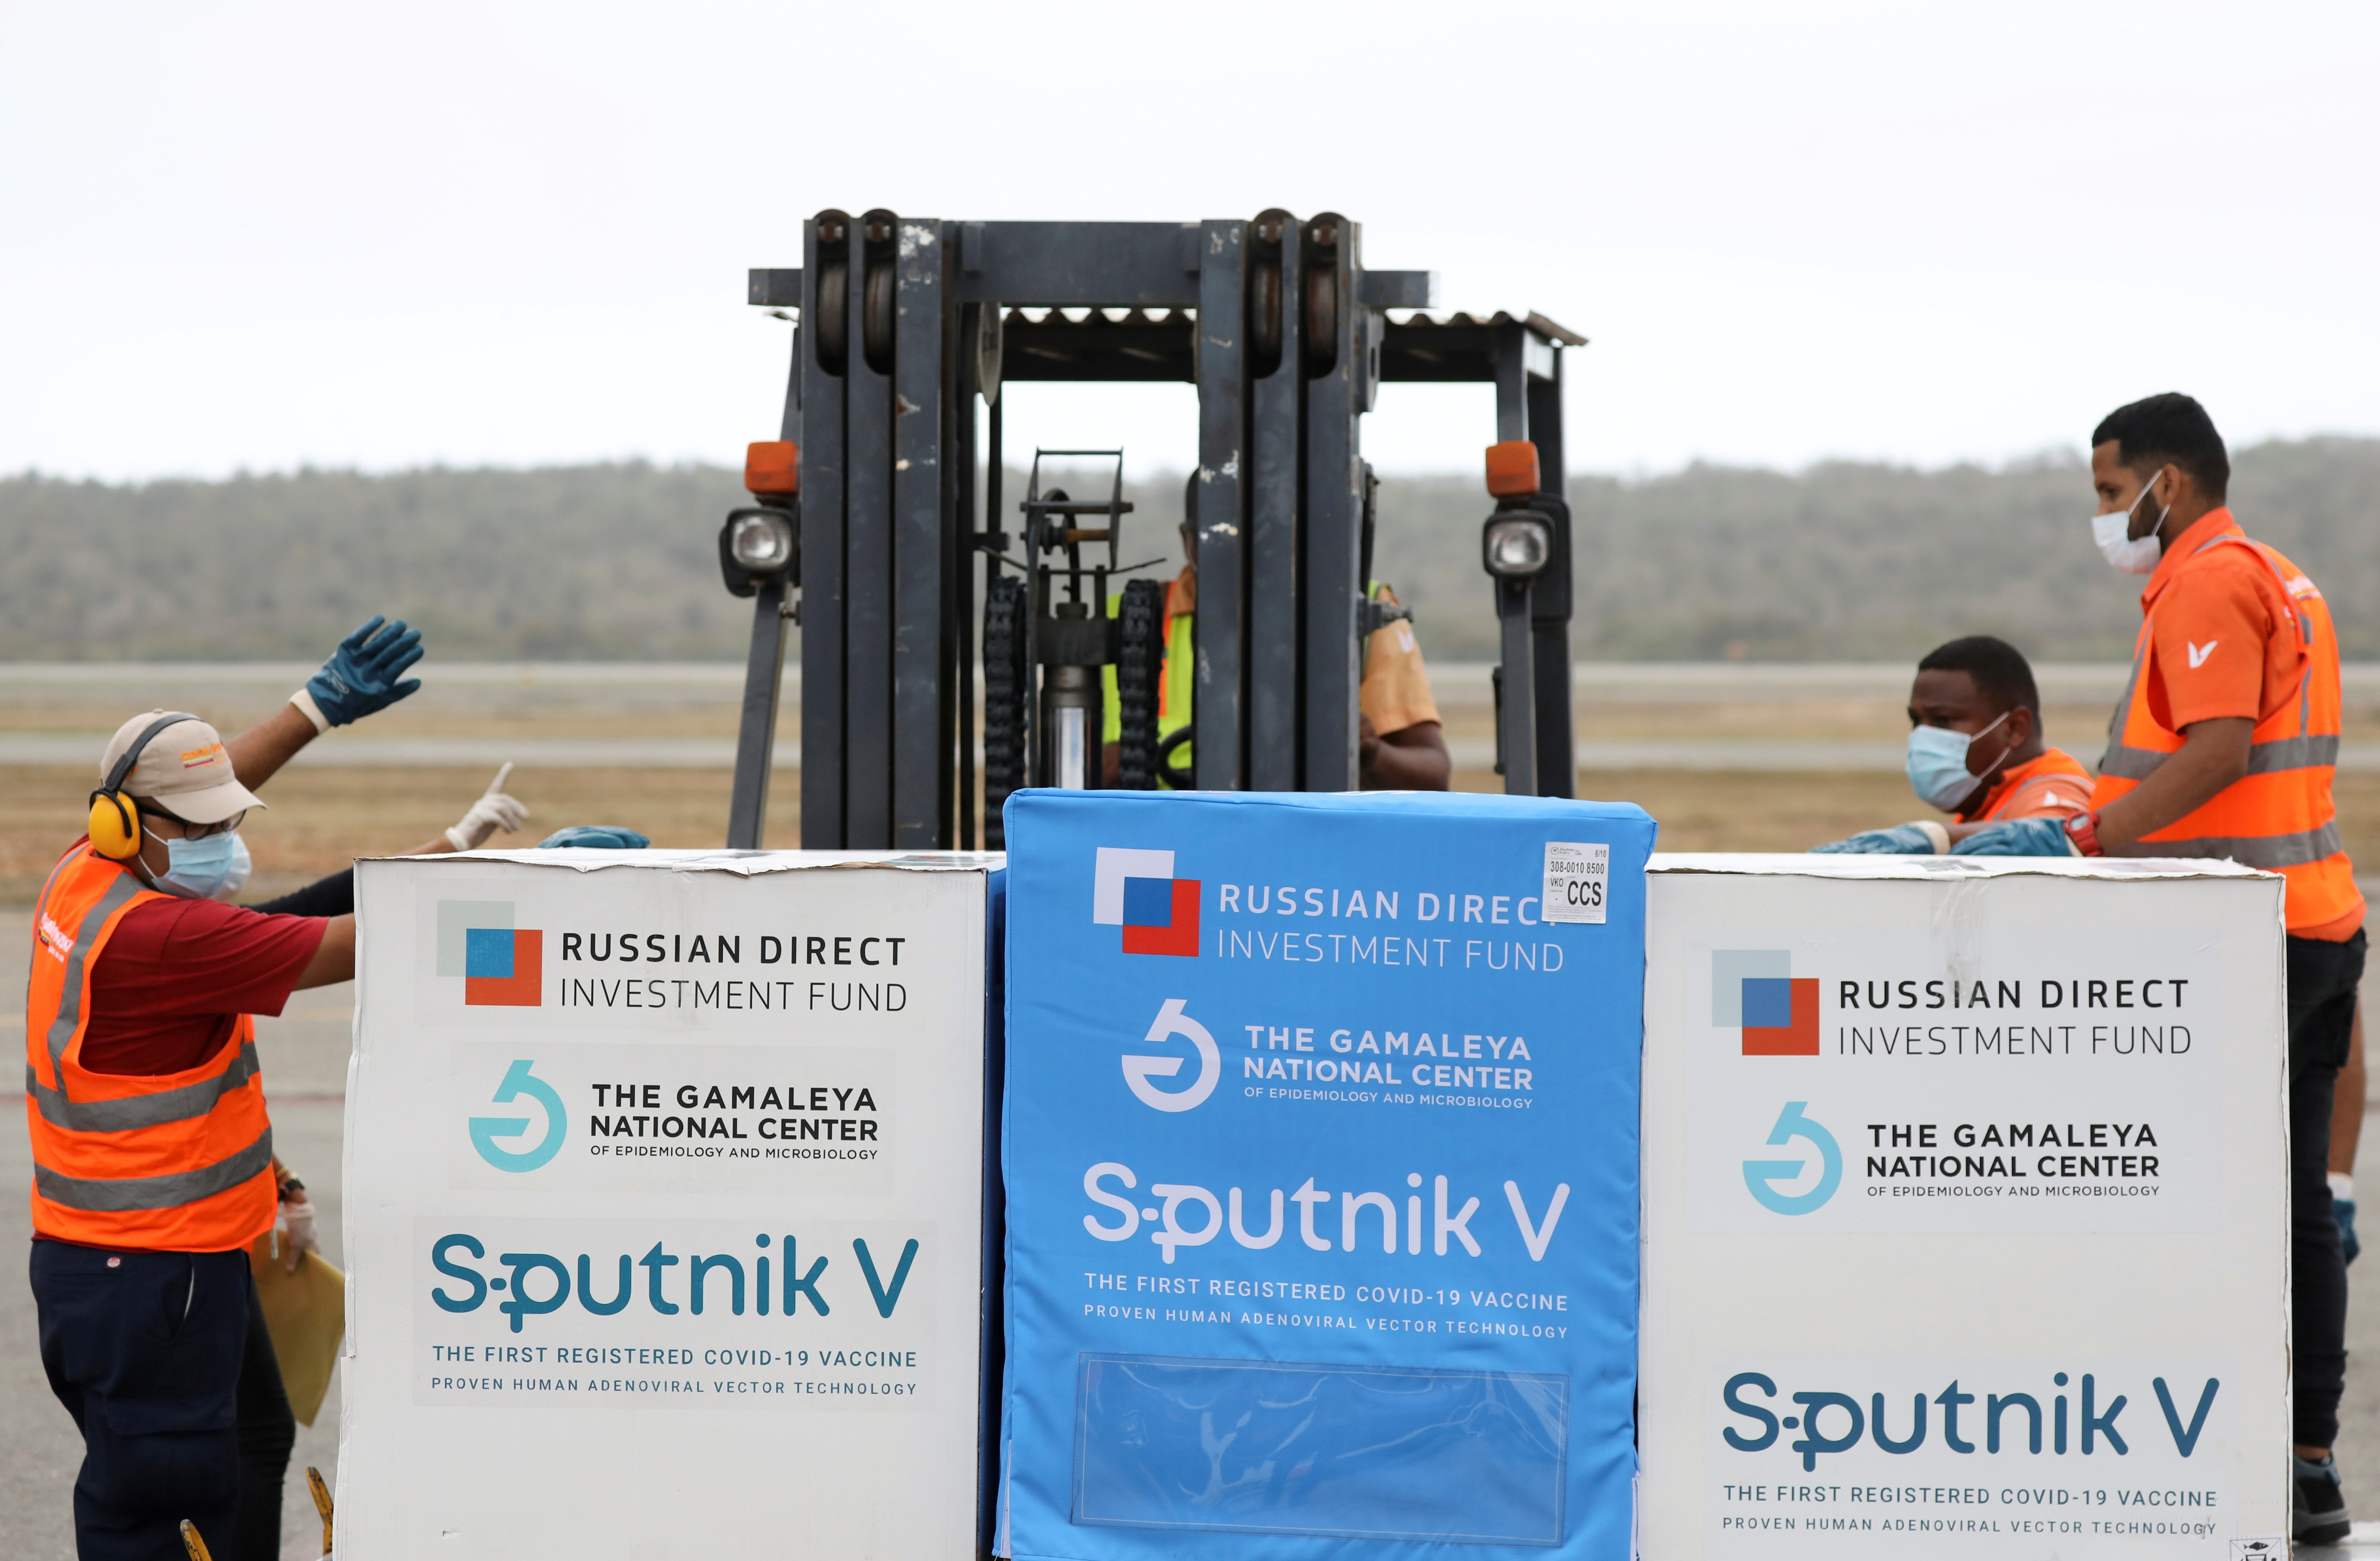 Niterói compra a Sputnik V